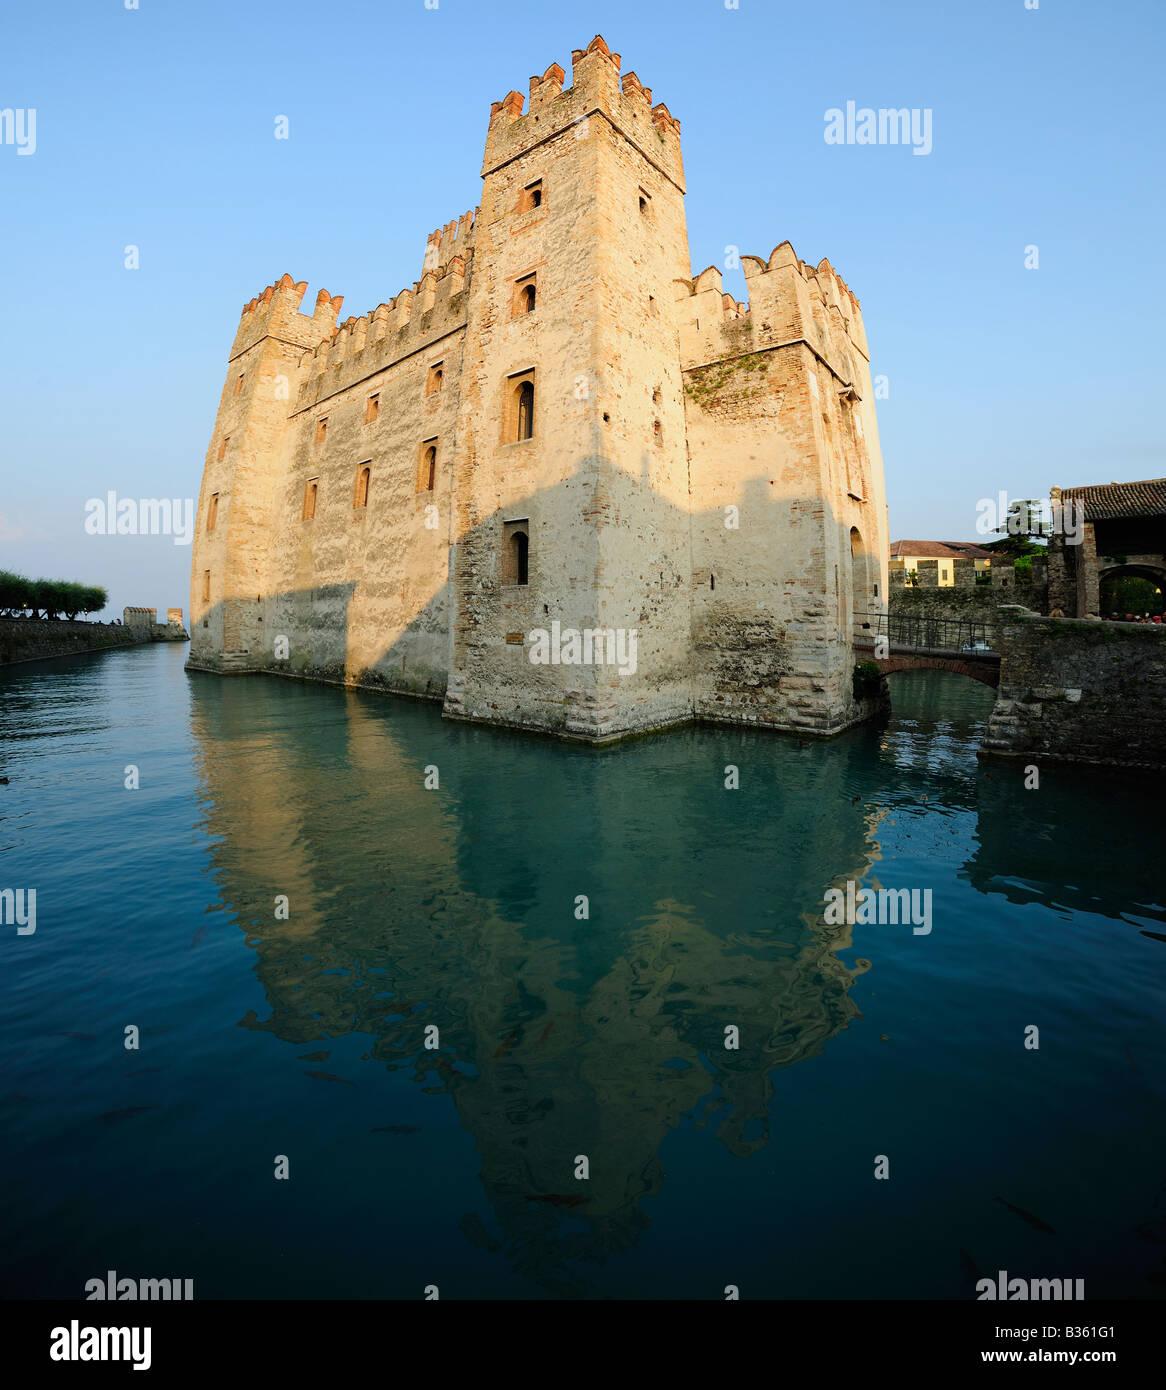 Castle Sirmione.  Lake Garda, Italy - Stock Image